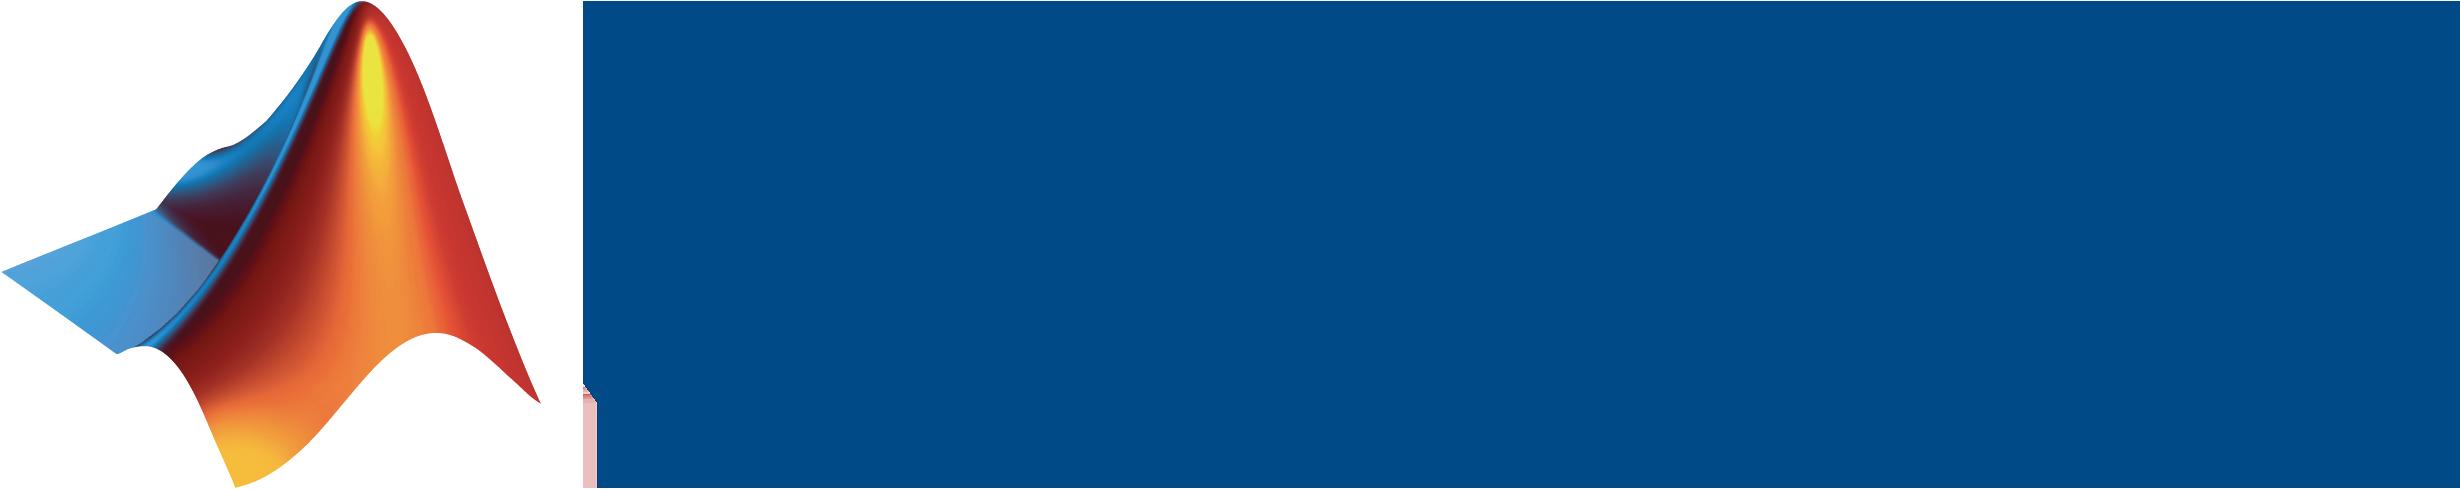 mathworks-logo-full-color-rgb.png